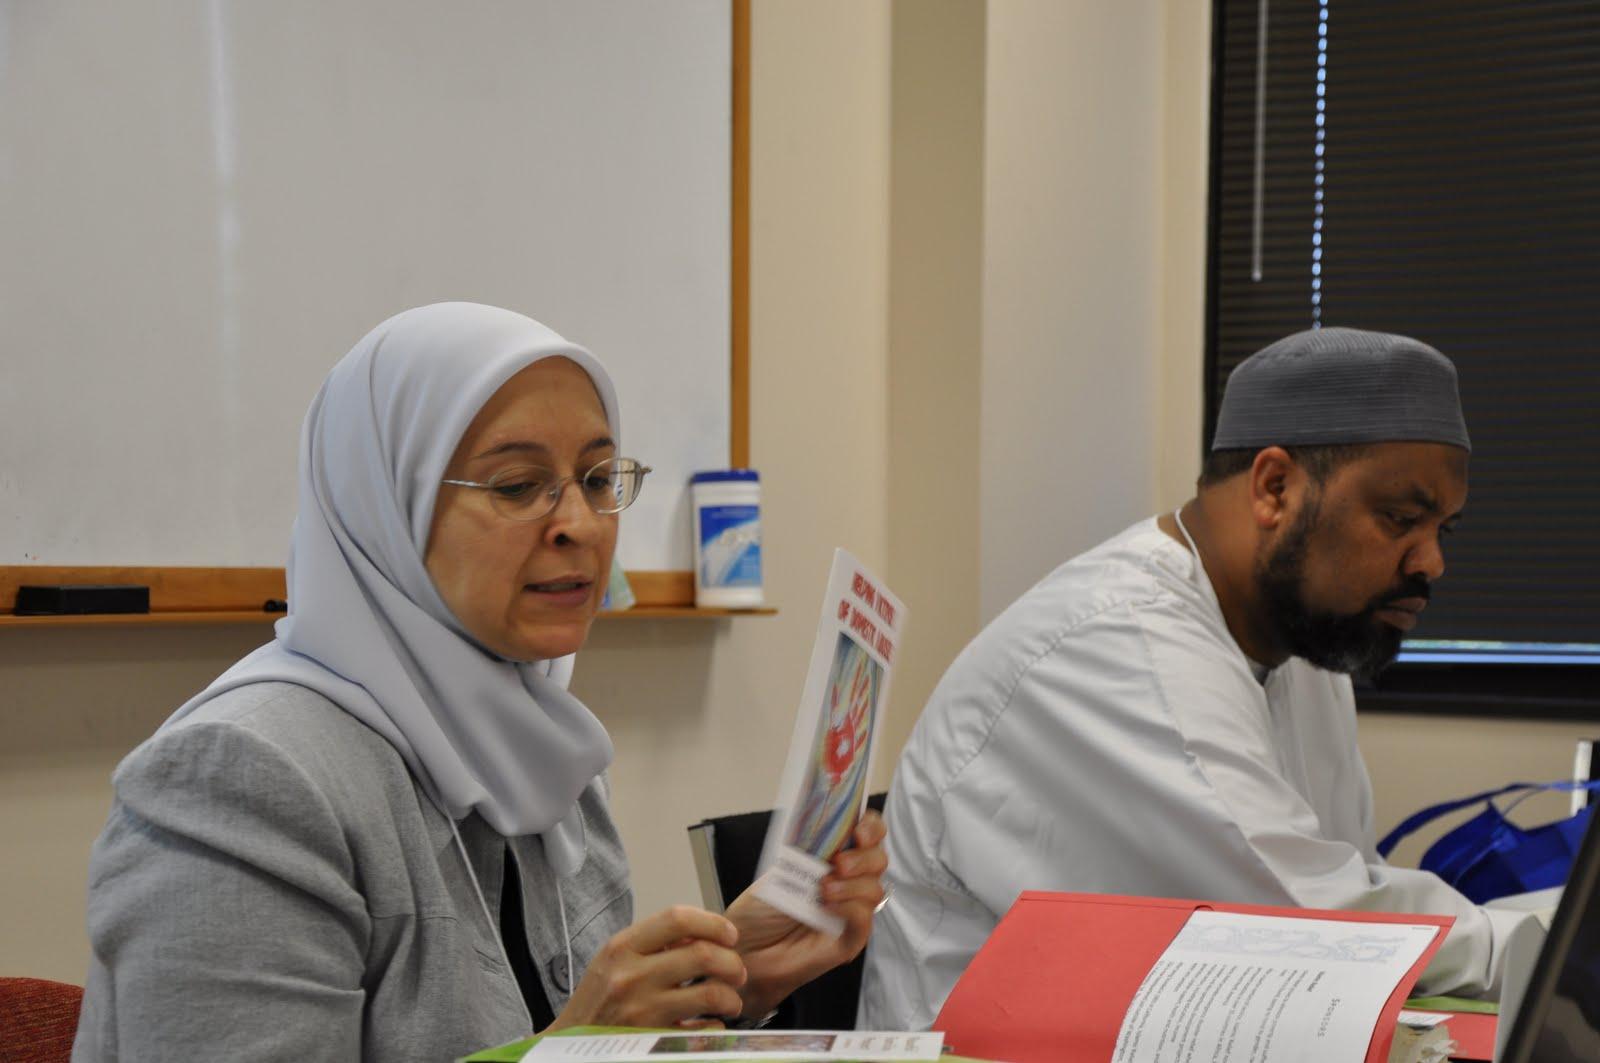 herndon muslim African muslim agency: employer identification number (ein) 541382088: name of organization: african muslim agency: address: 459 herndon pkwy ste 12, herndon, va 20170-6222: activities.